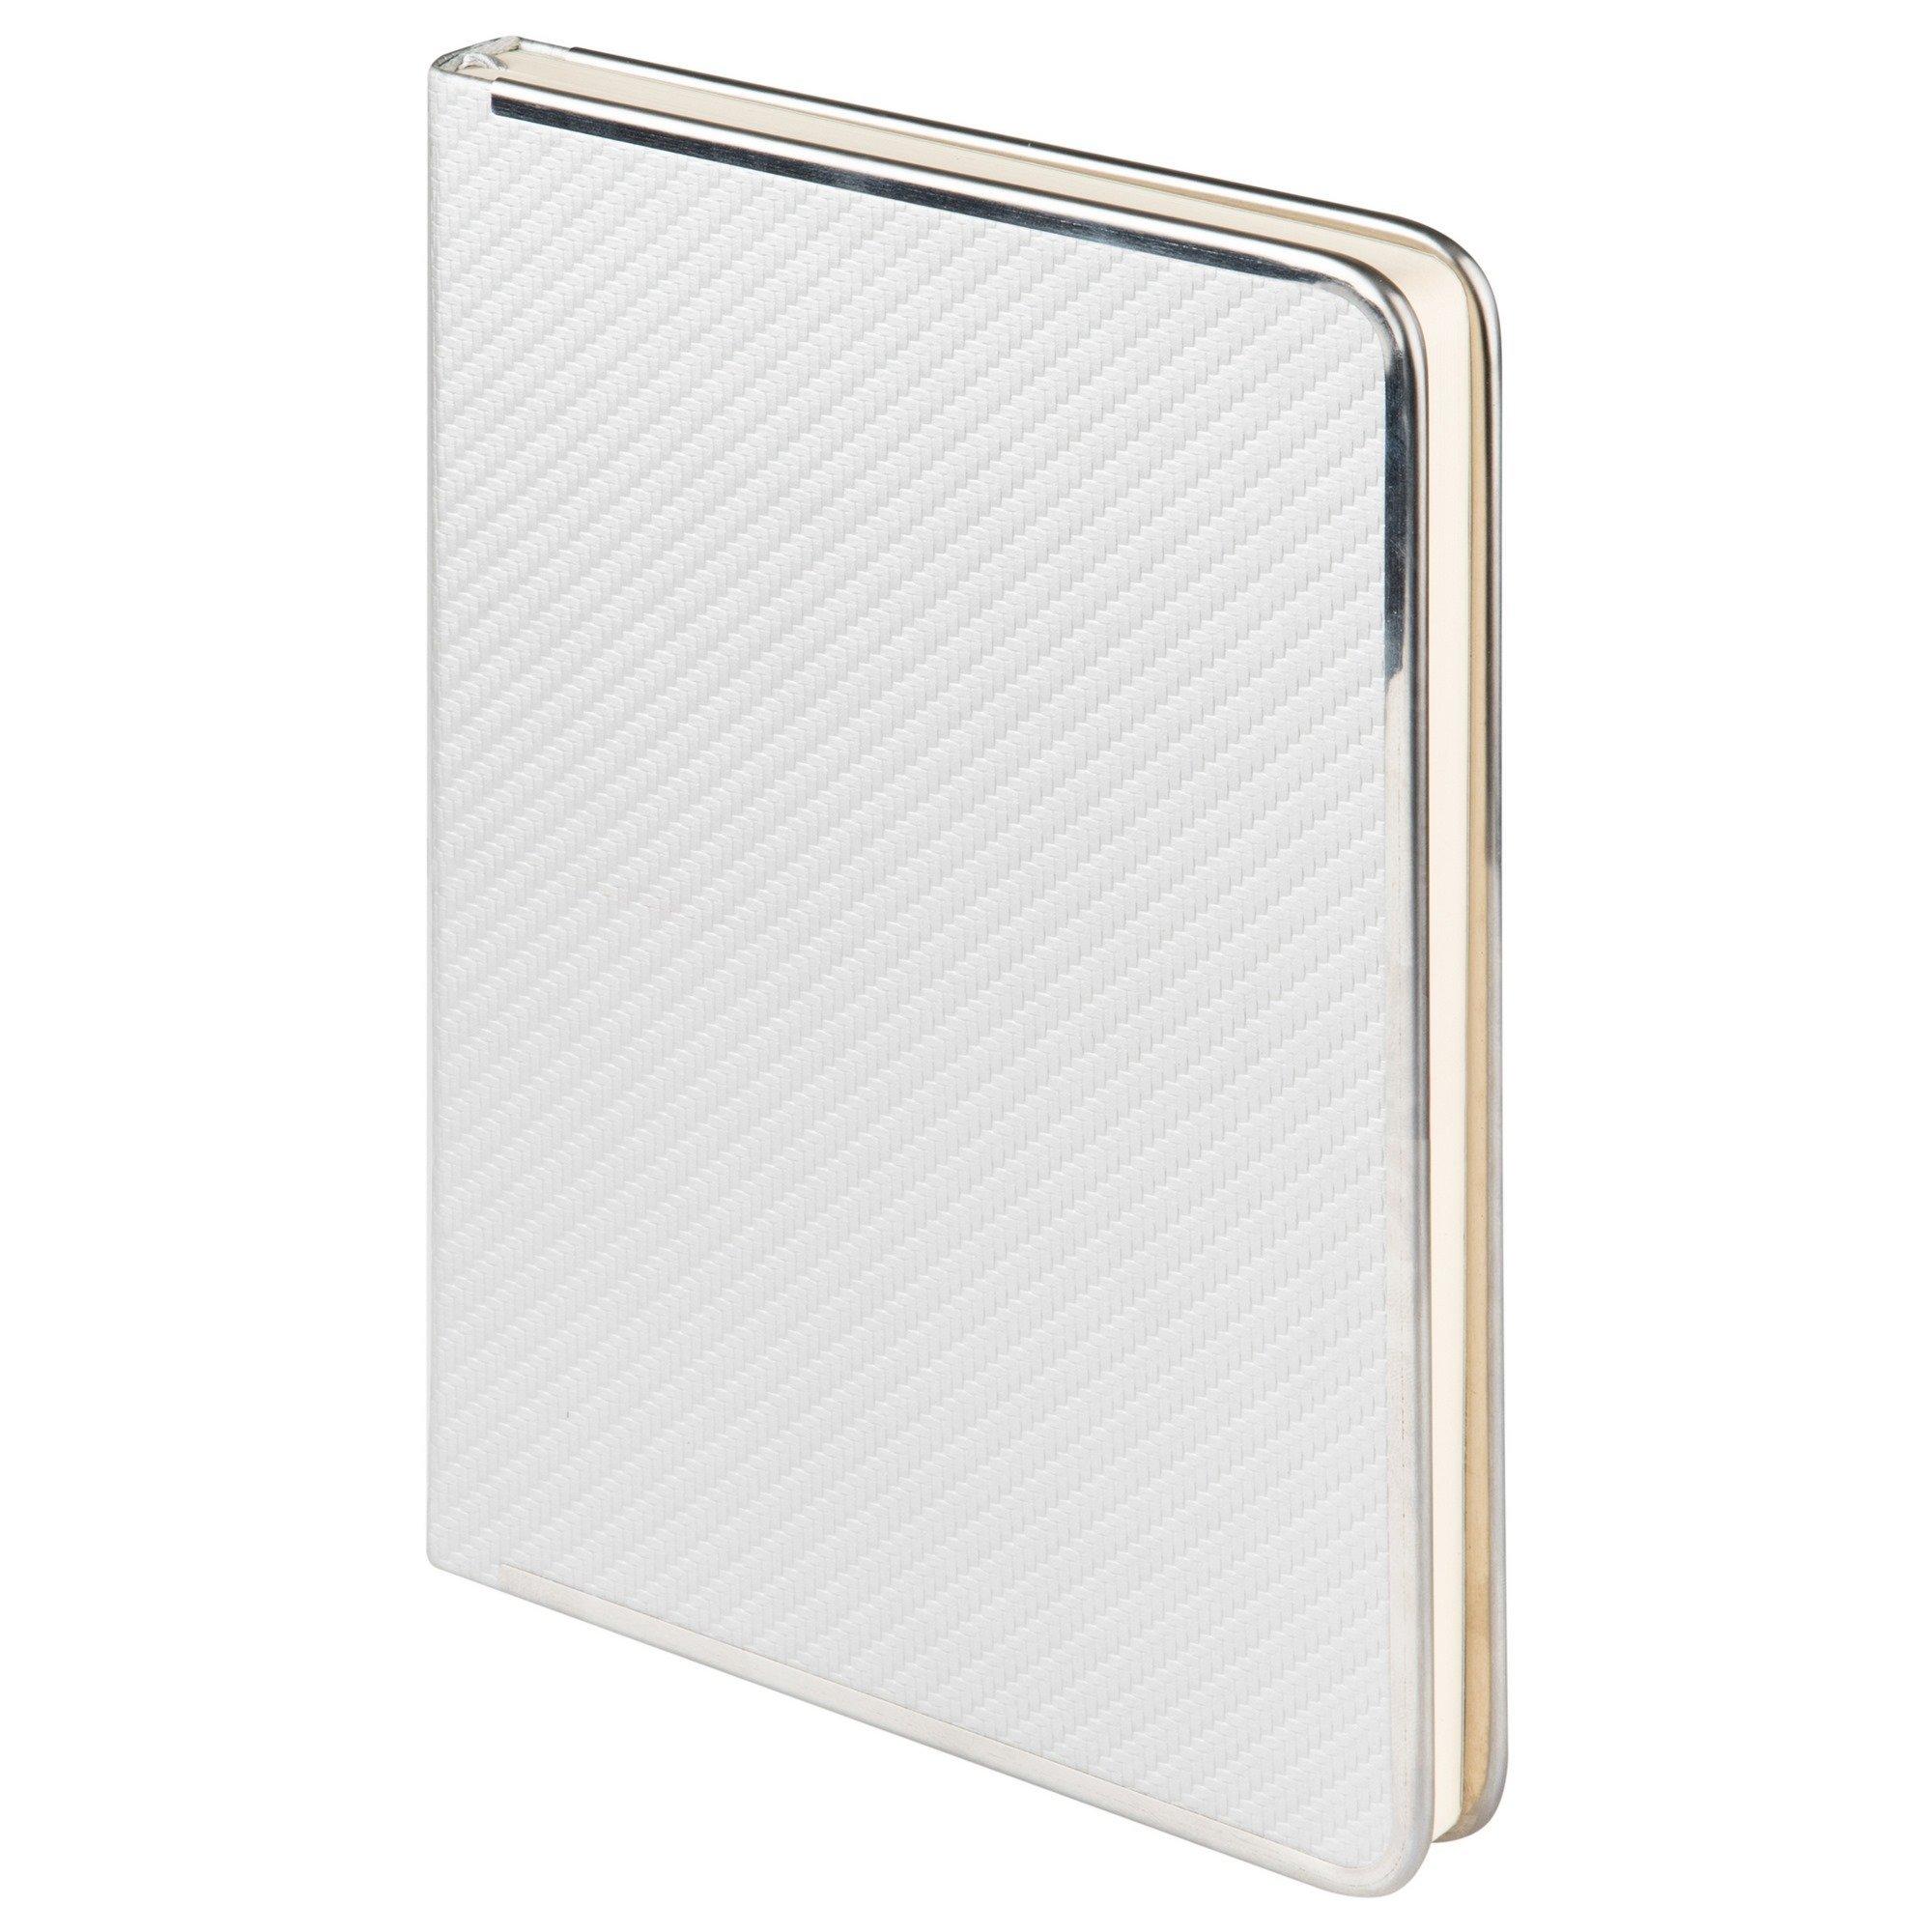 Ежедневник недатированный, Portobello Trend, Carbon , 145х210, 256 стр, серебро